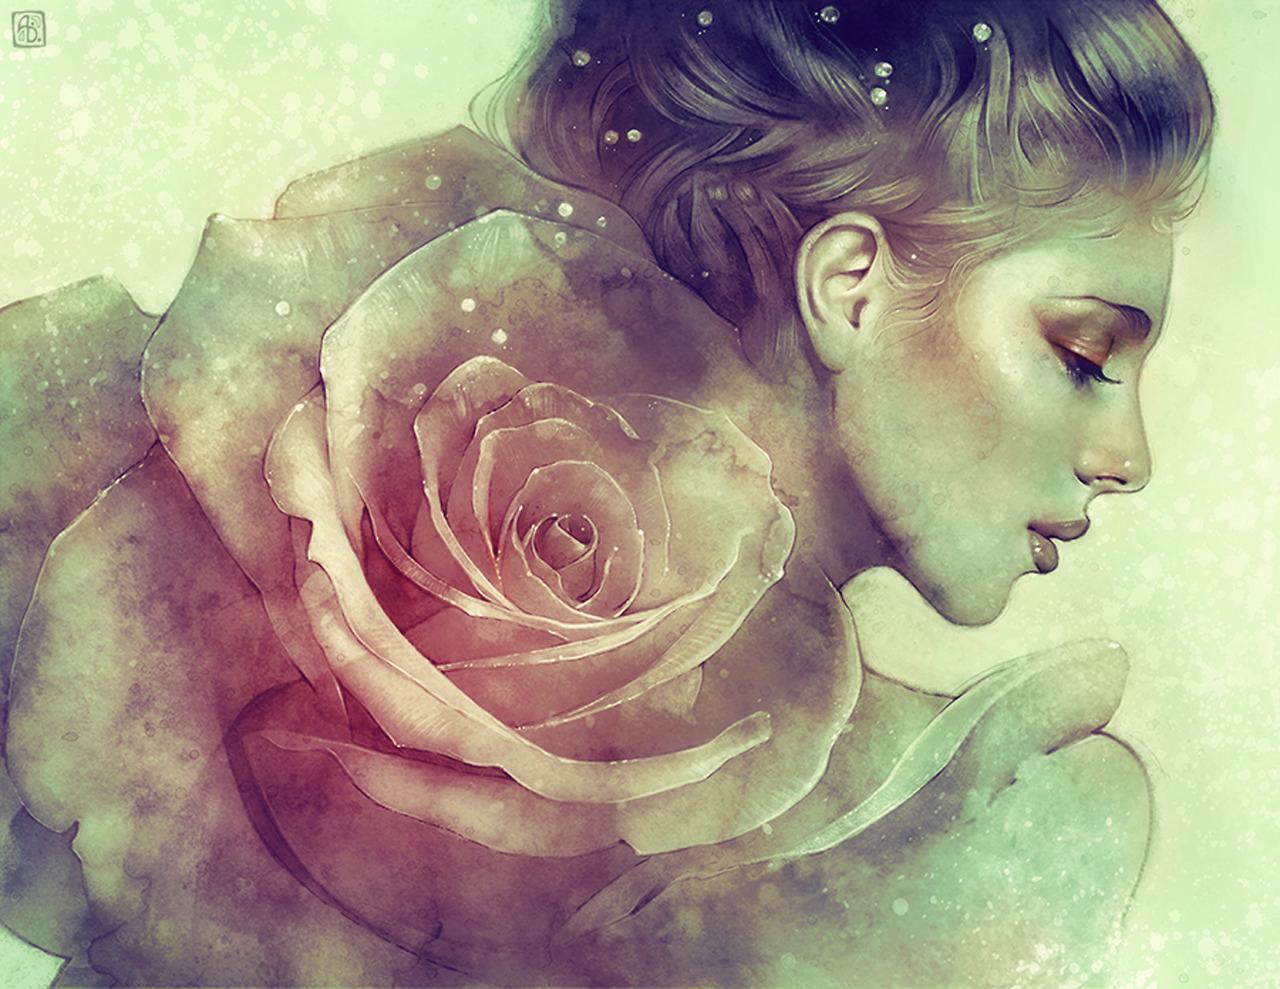 june - by anna dittmann - digital illustration